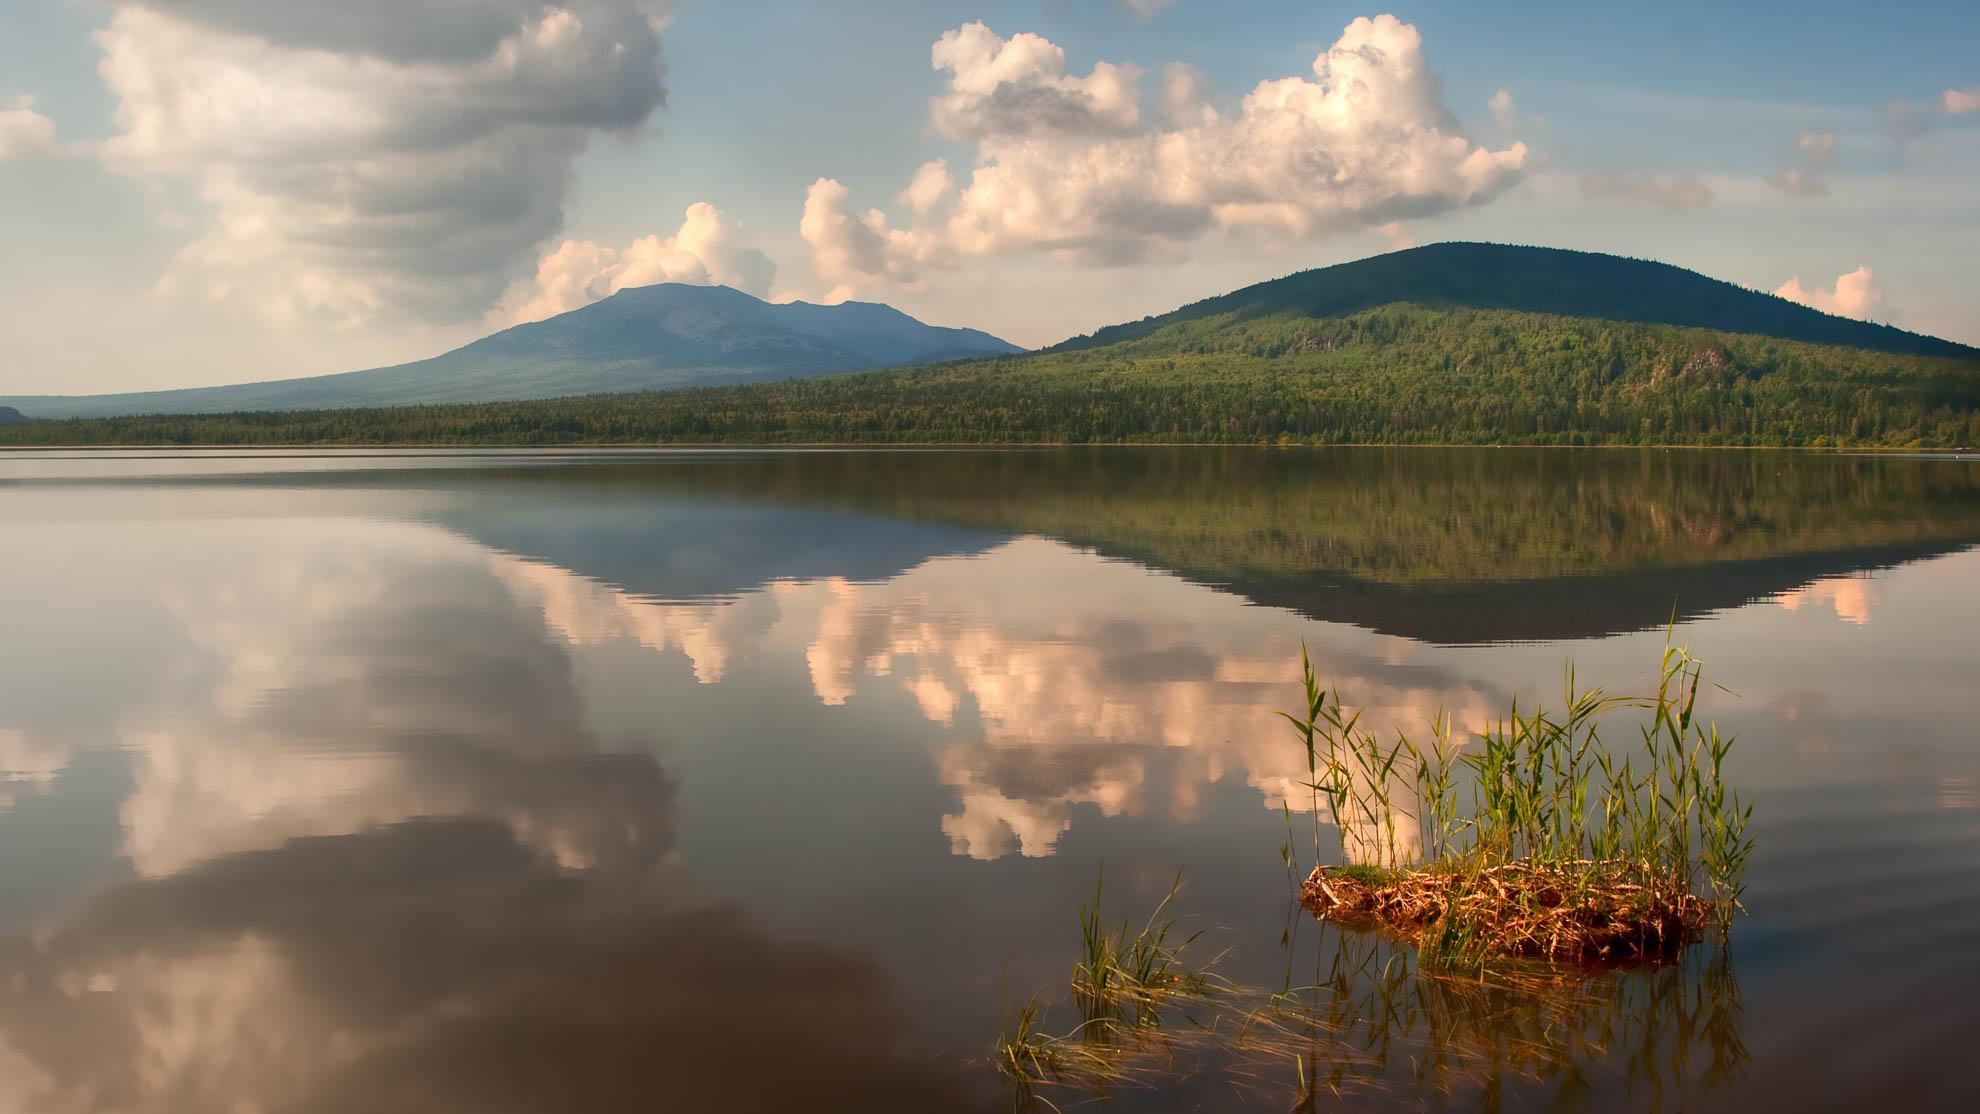 Озеро Зюраткуль. Фотограф Вадим Кукшинов